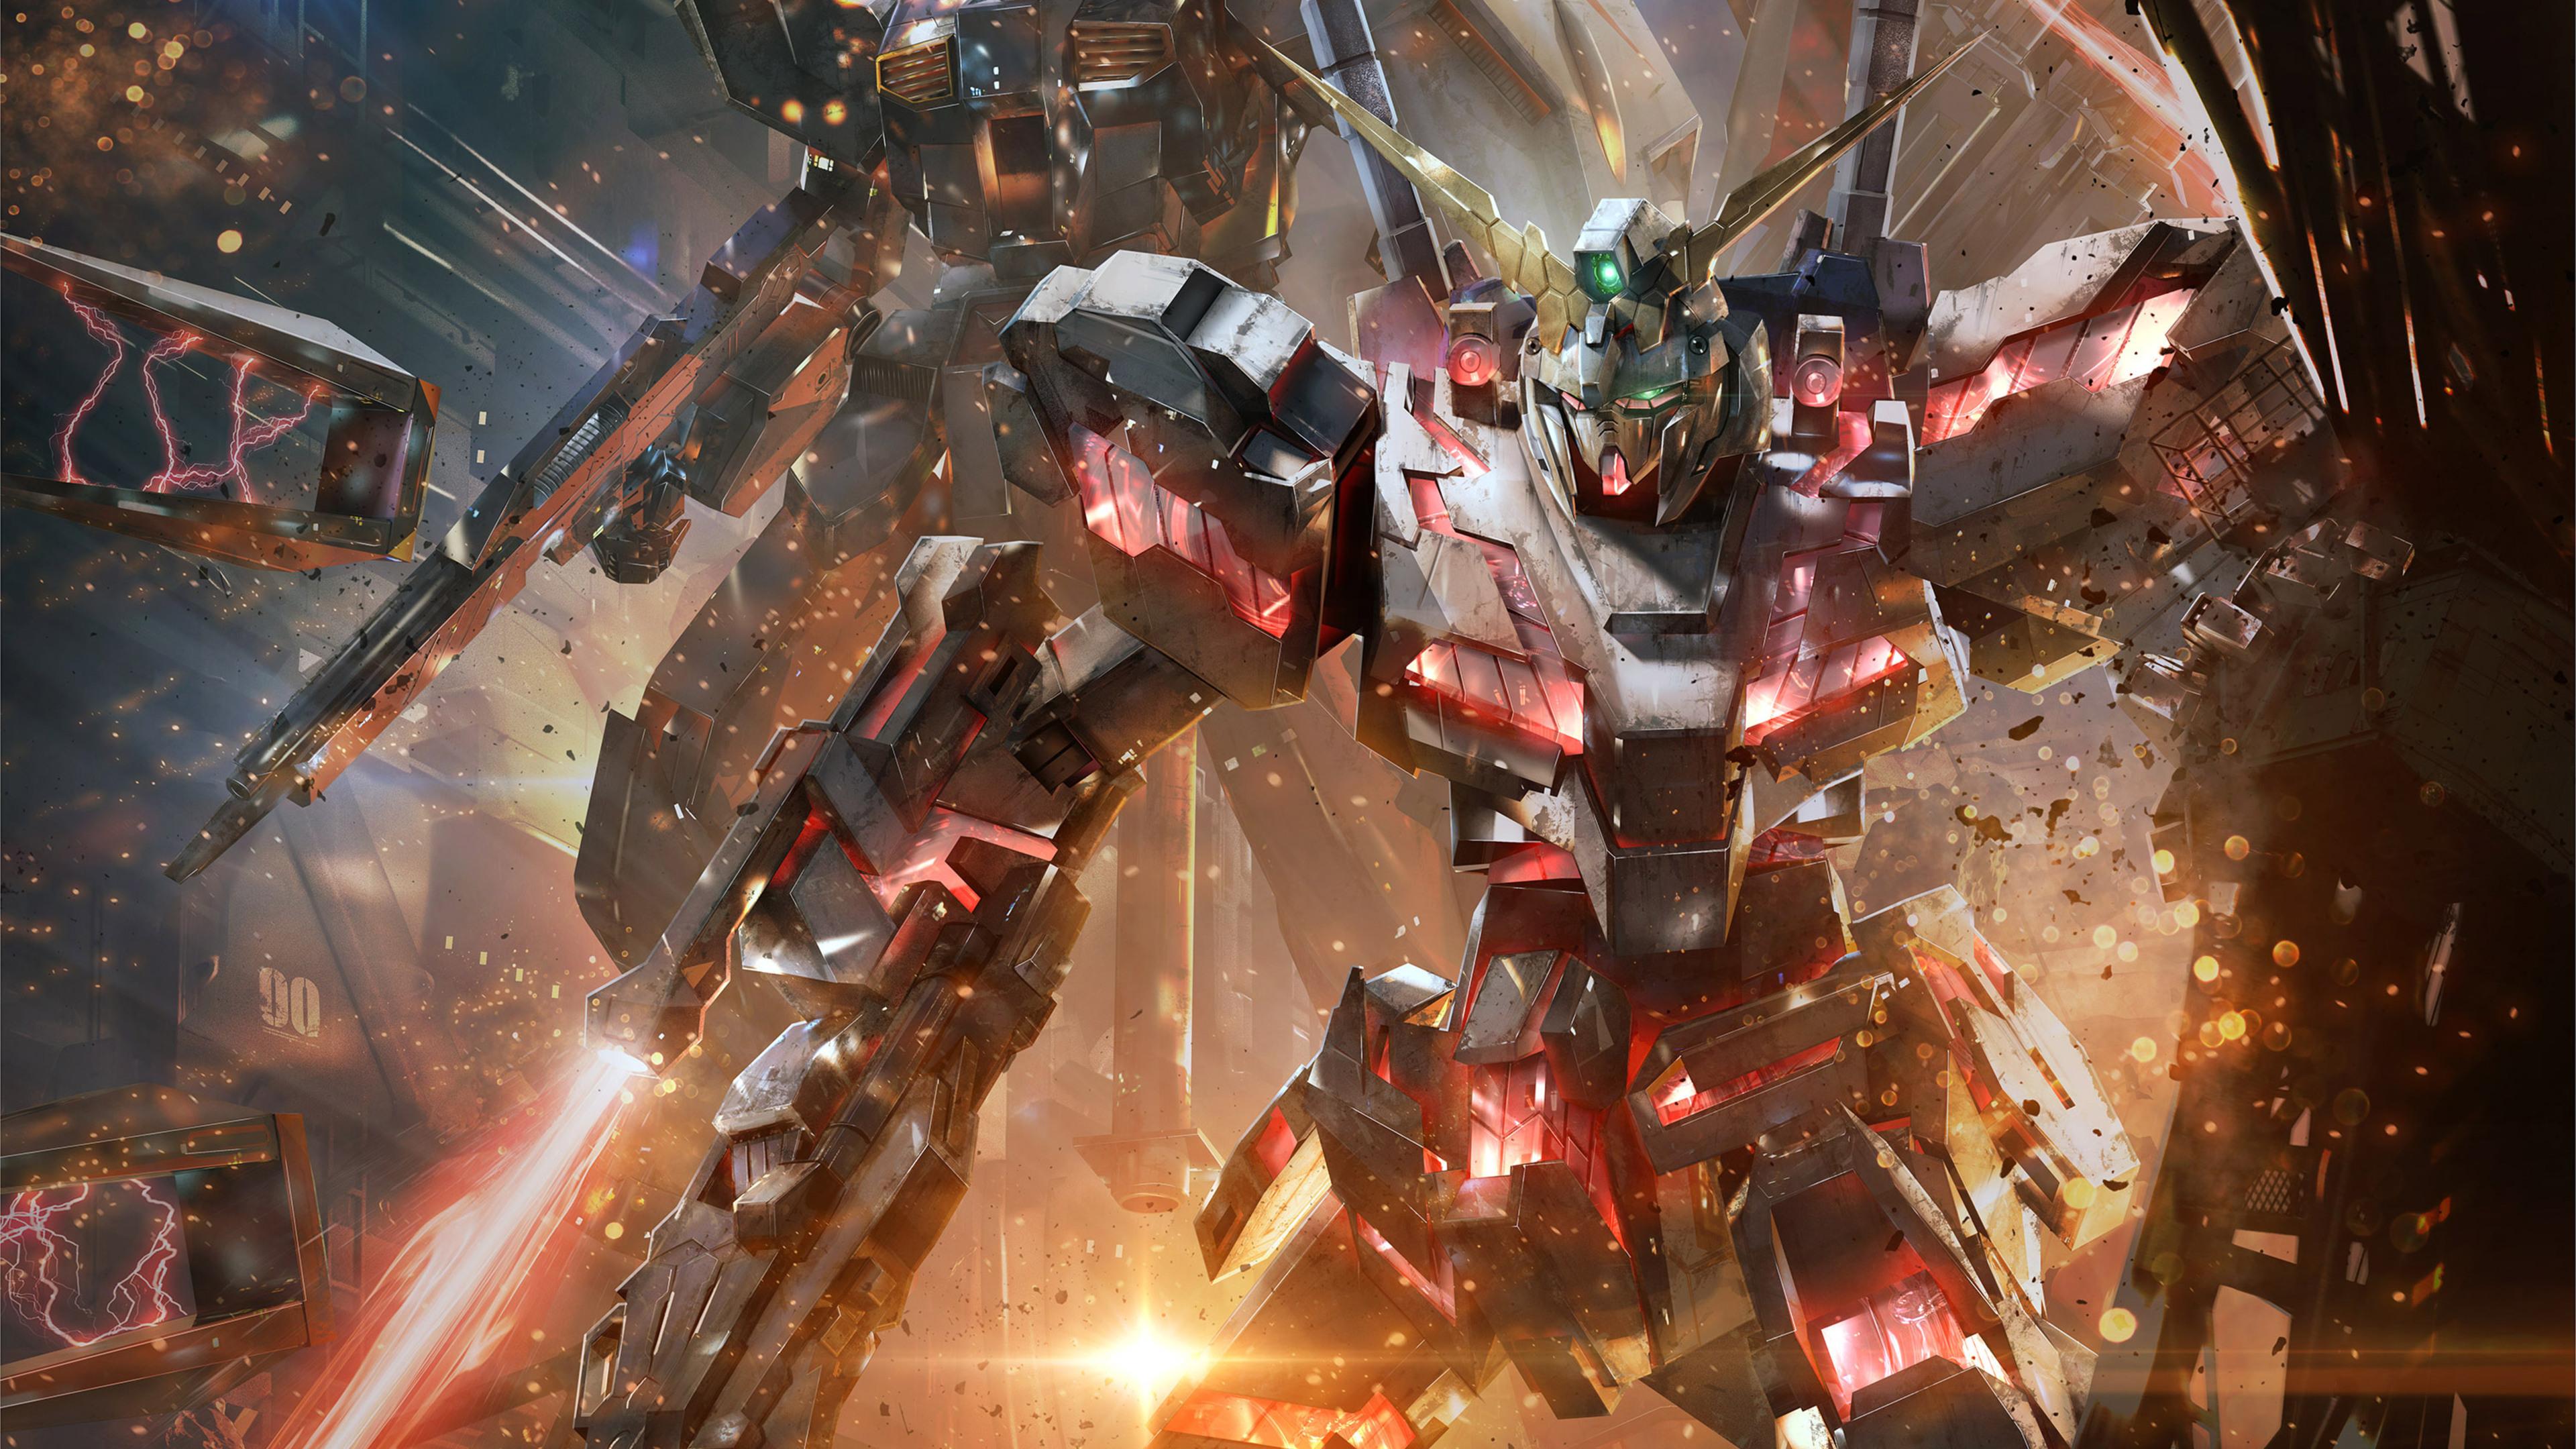 Hd Gundam Themes: Gundam Versus 4k Ultra HD Wallpaper